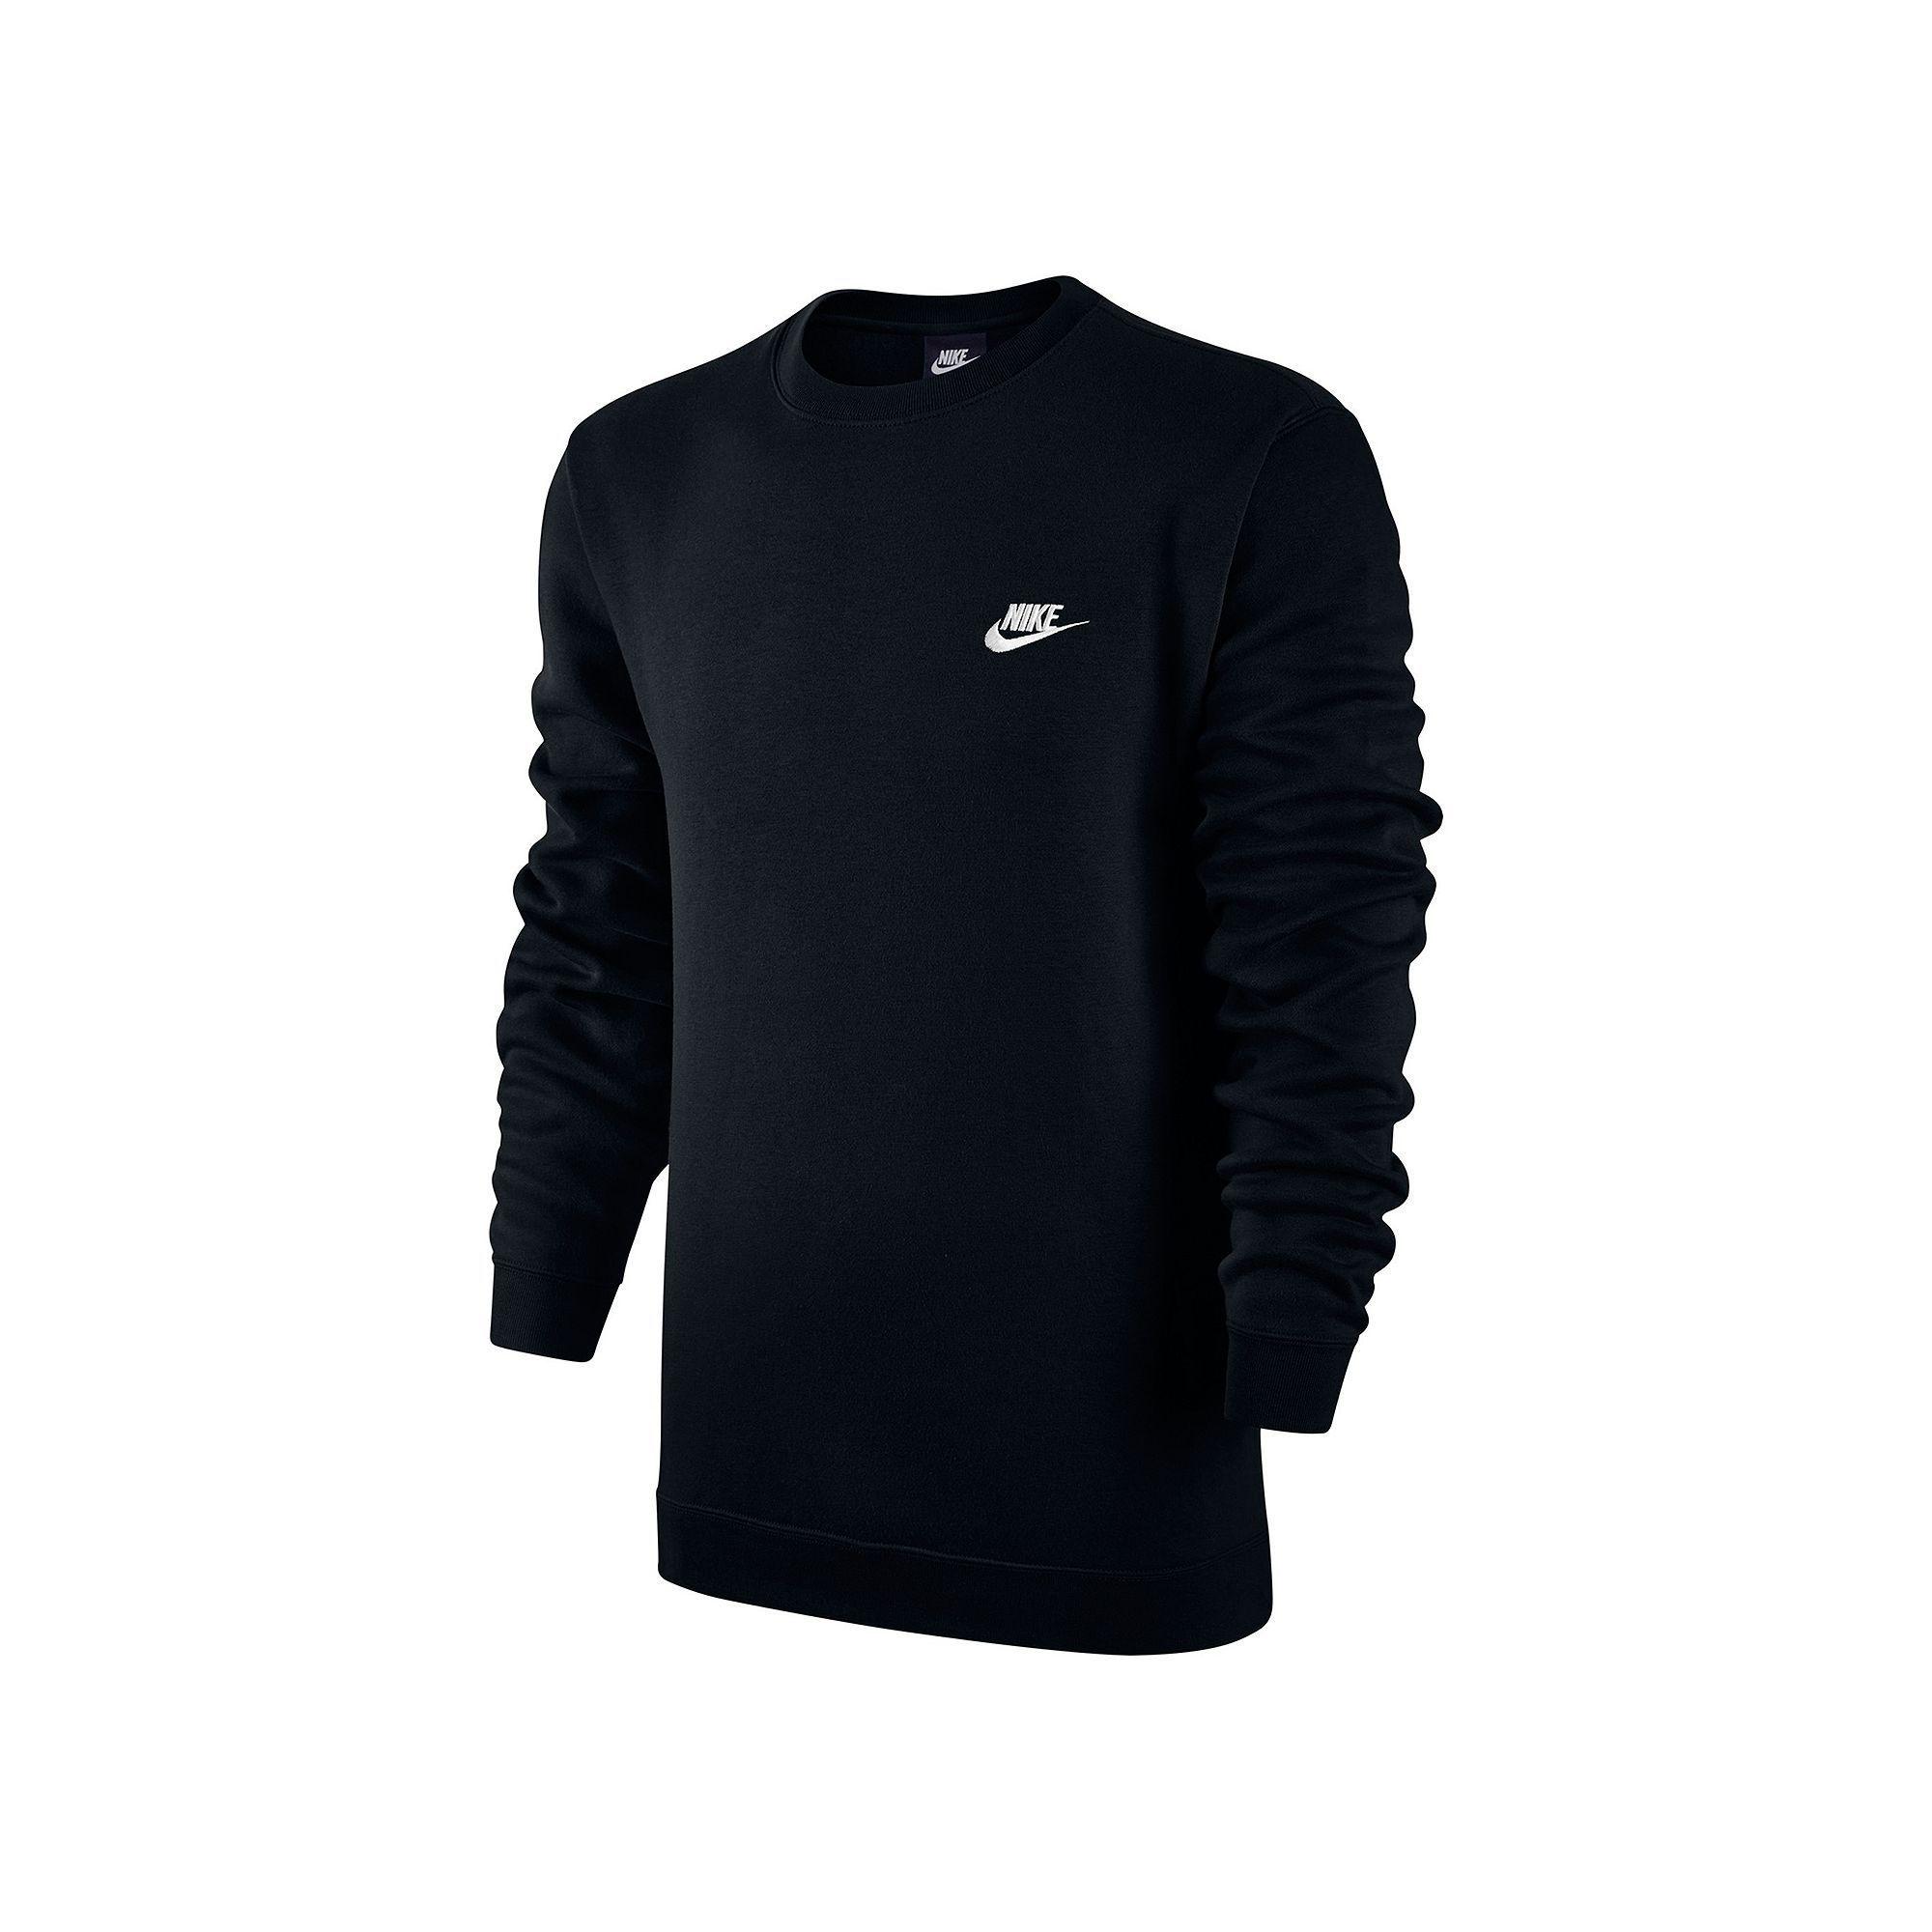 Men's Nike Club Crew Fleece, Size: Medium, Grey (Charcoal)